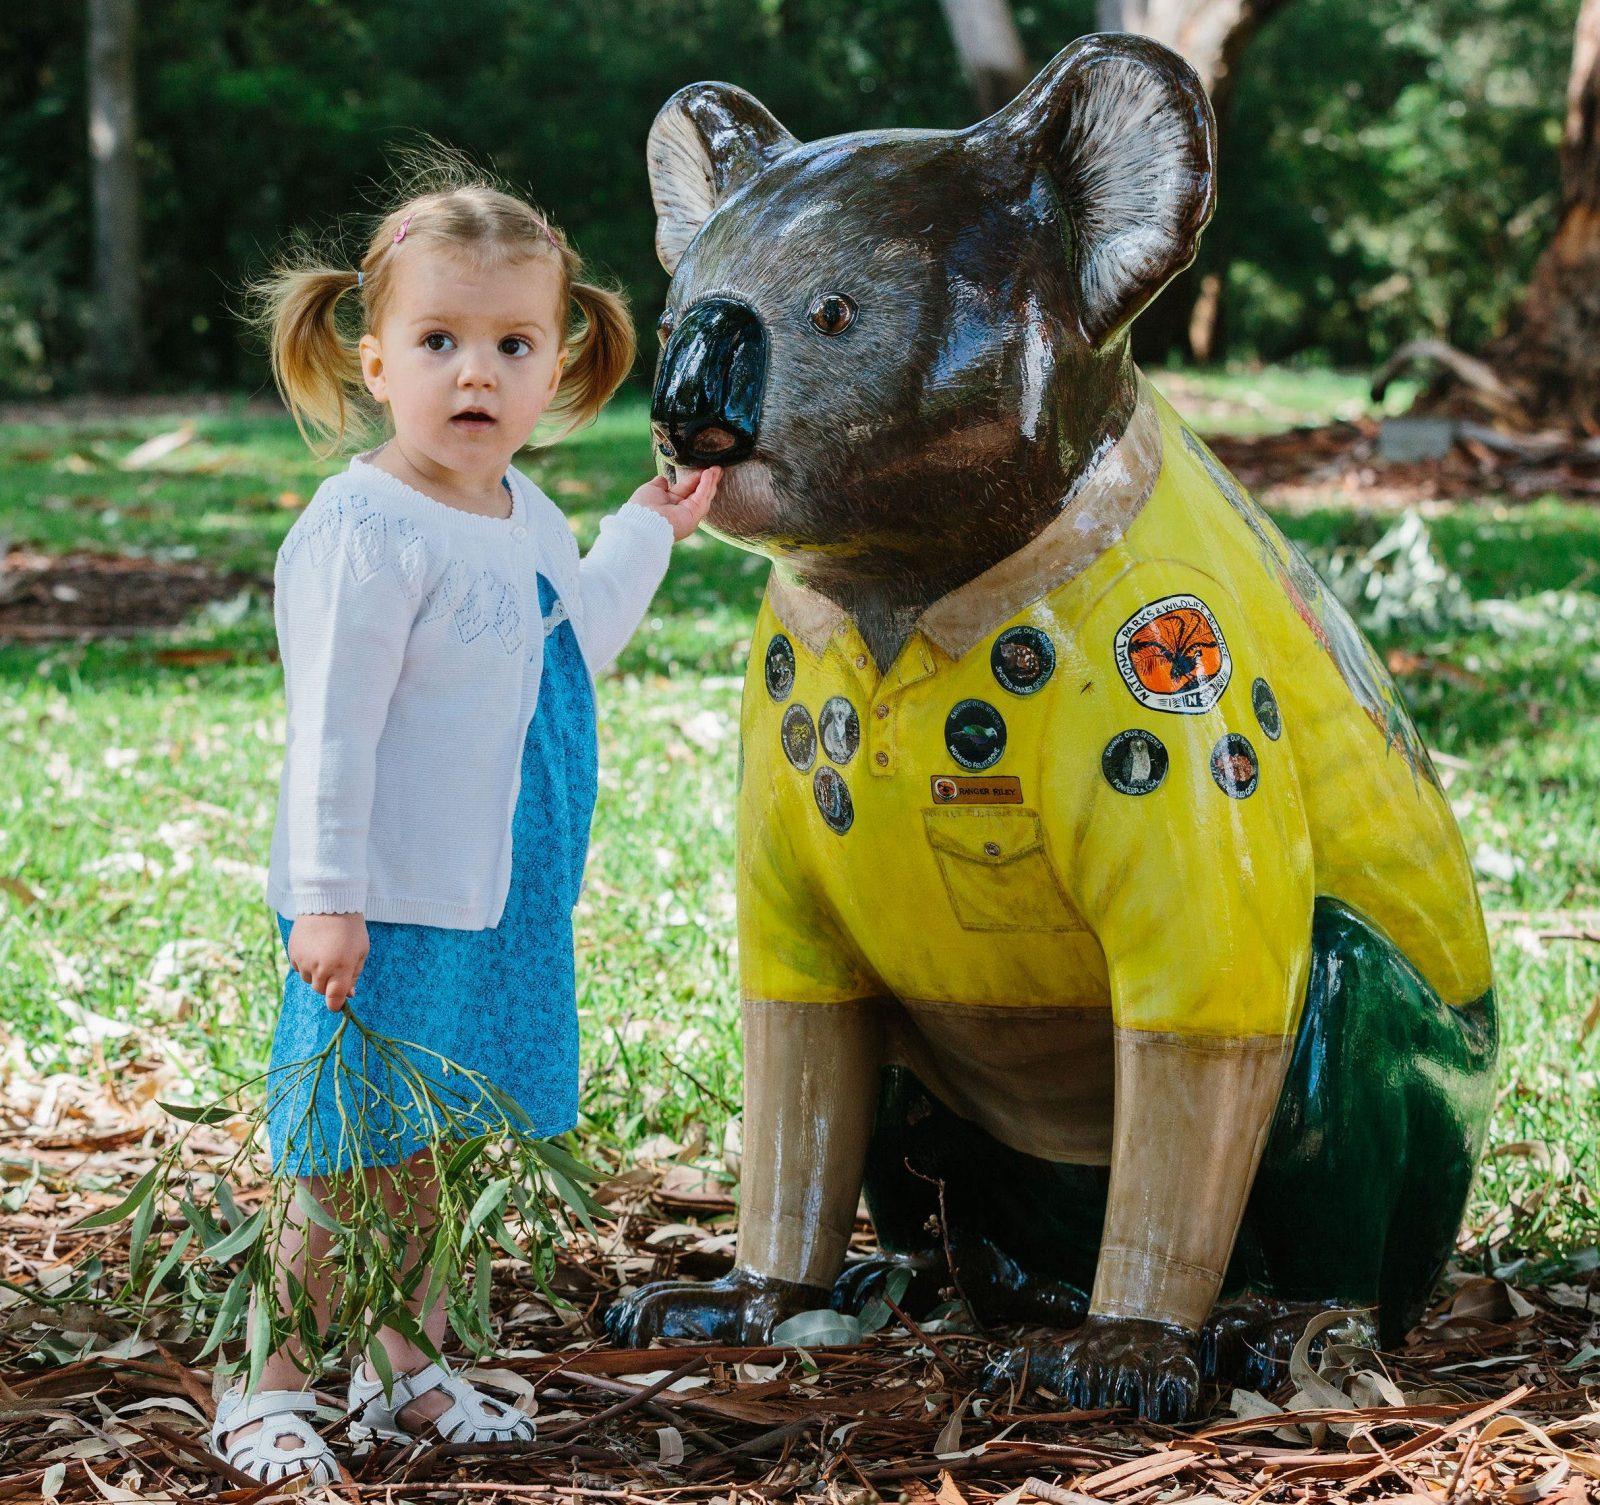 Little girl feeding eucalypt leaves to Hello Koalas sculpture Ranger Riley in the Eucalypt Garden